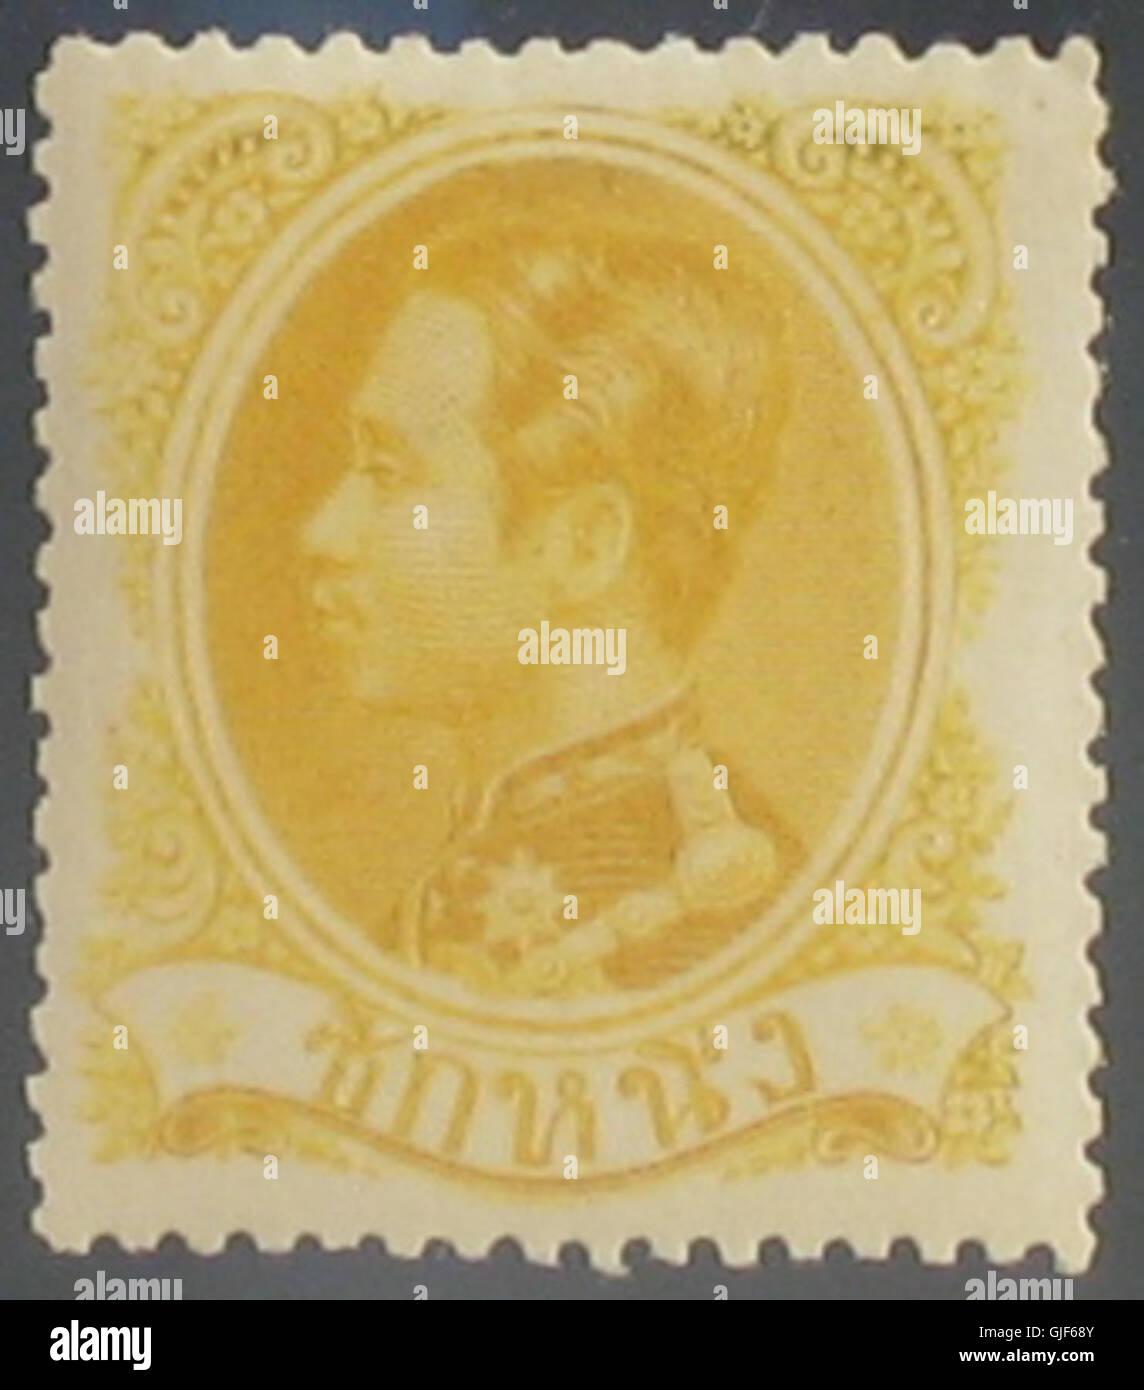 1er timbre thaïlandais sik Photo Stock